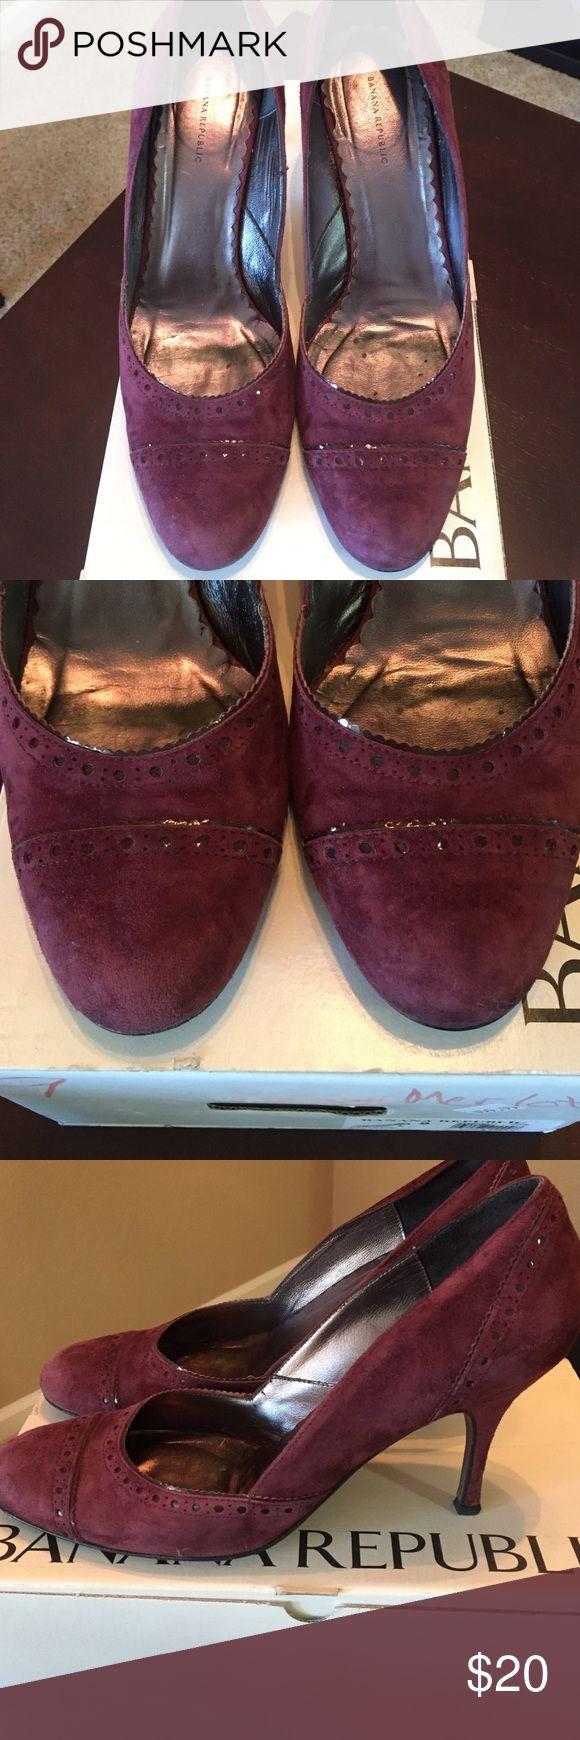 Banana Republic Suede Merlot Heels Banana Republic Merlot Suede Heels- Sz 9.  With original box, great condition. Banana Republic Shoes Heels